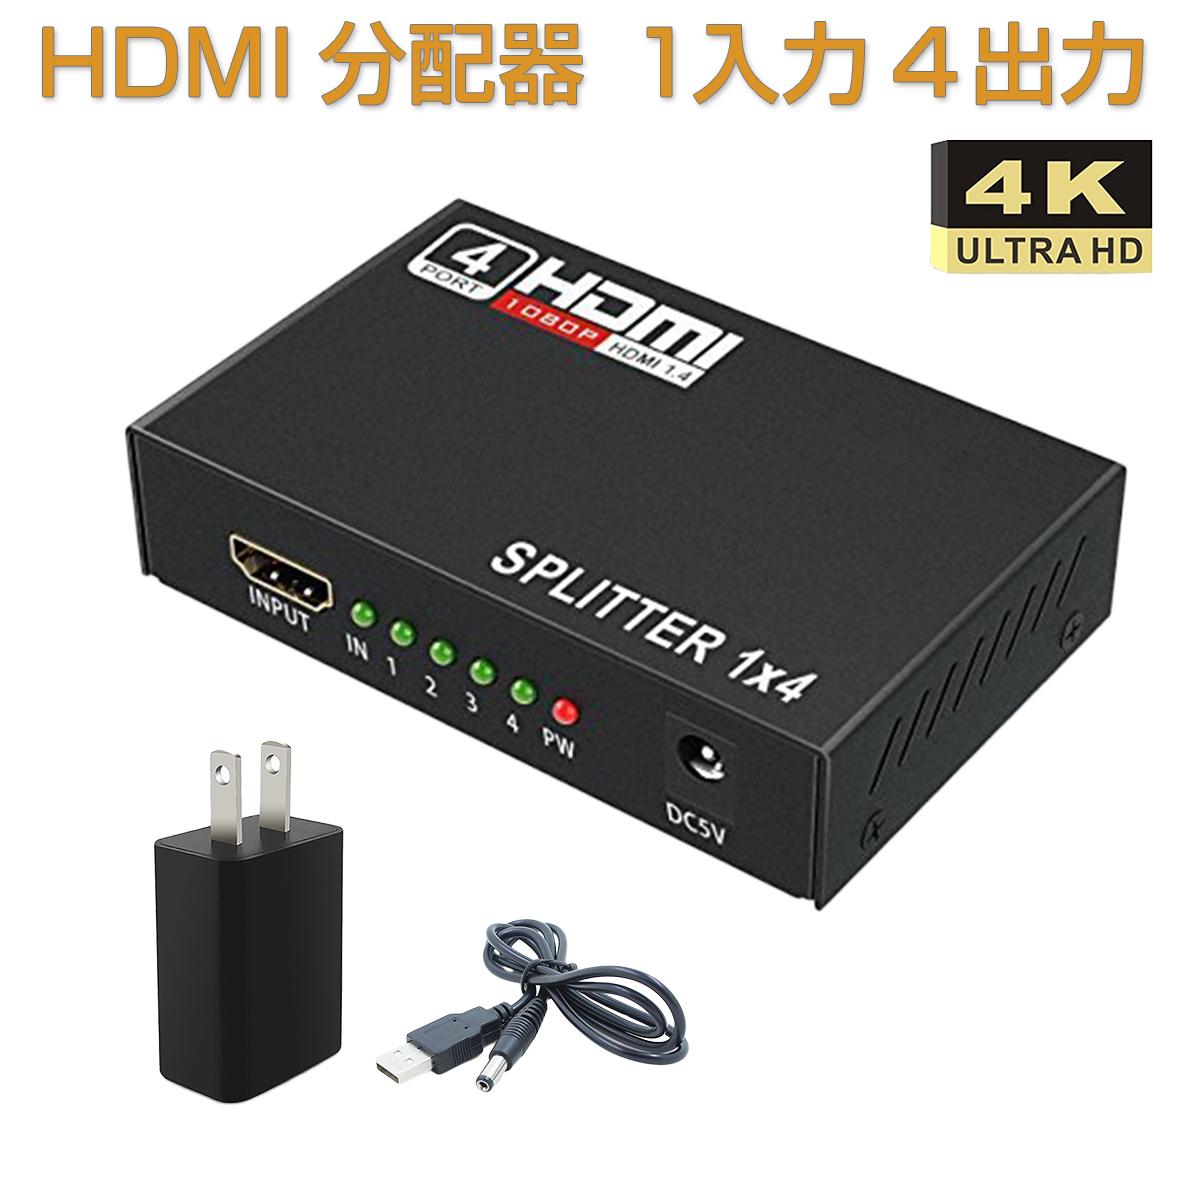 HDMI分配器 HDMIスプリッター 1入力4出力 4K 2K FHD対応 自動切り替え 3D映像対応 電源アダプター TV PC Xbox PS4 任天堂スイッチ Fire TV Stick 4k AppleTV プロジェクター等に対応 SDM便送料無料 1ヶ月保証 K&M